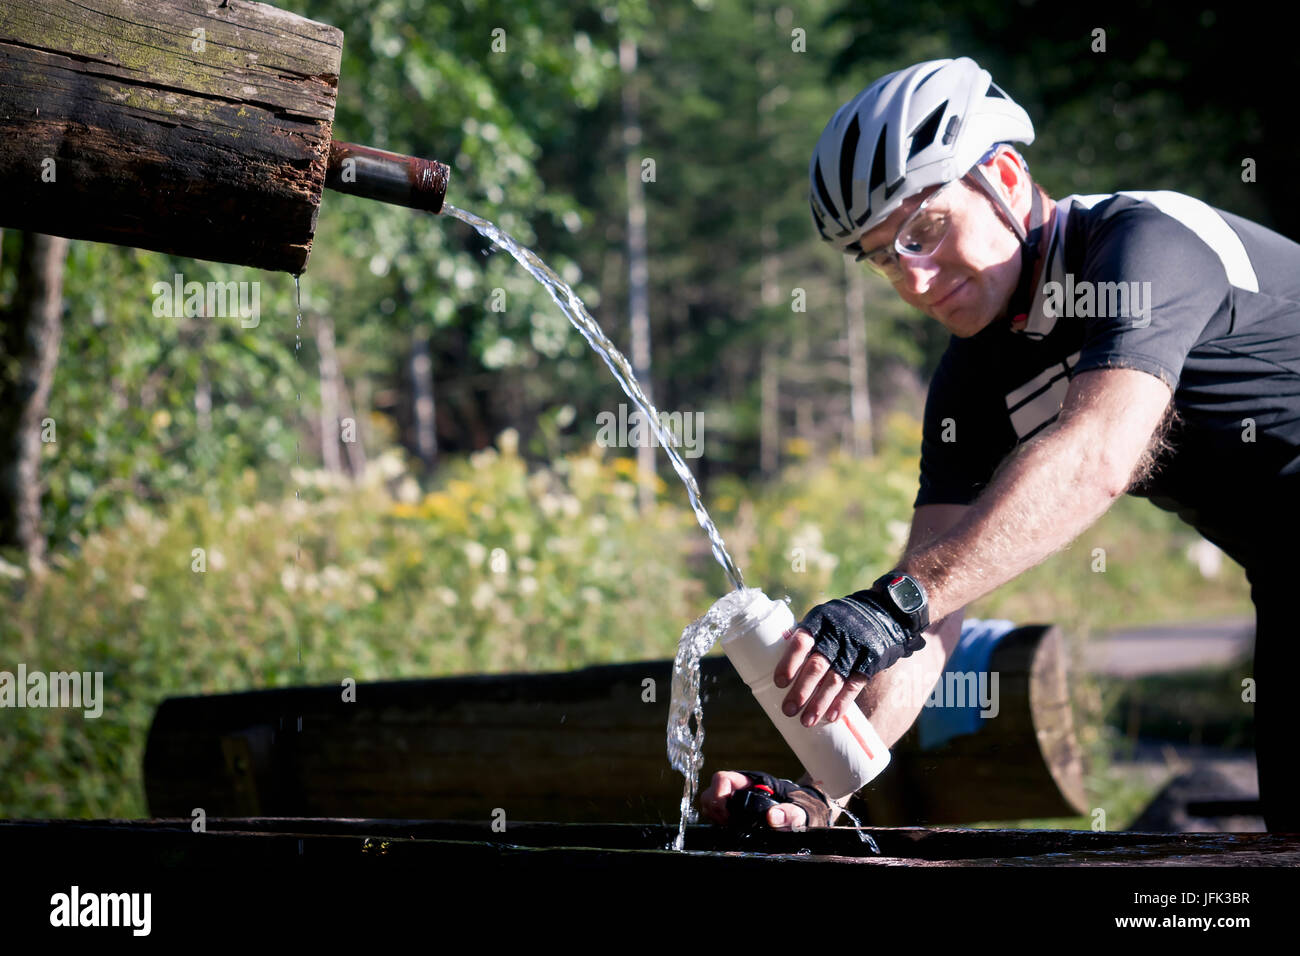 Biker filling water bottle in forest - Stock Image